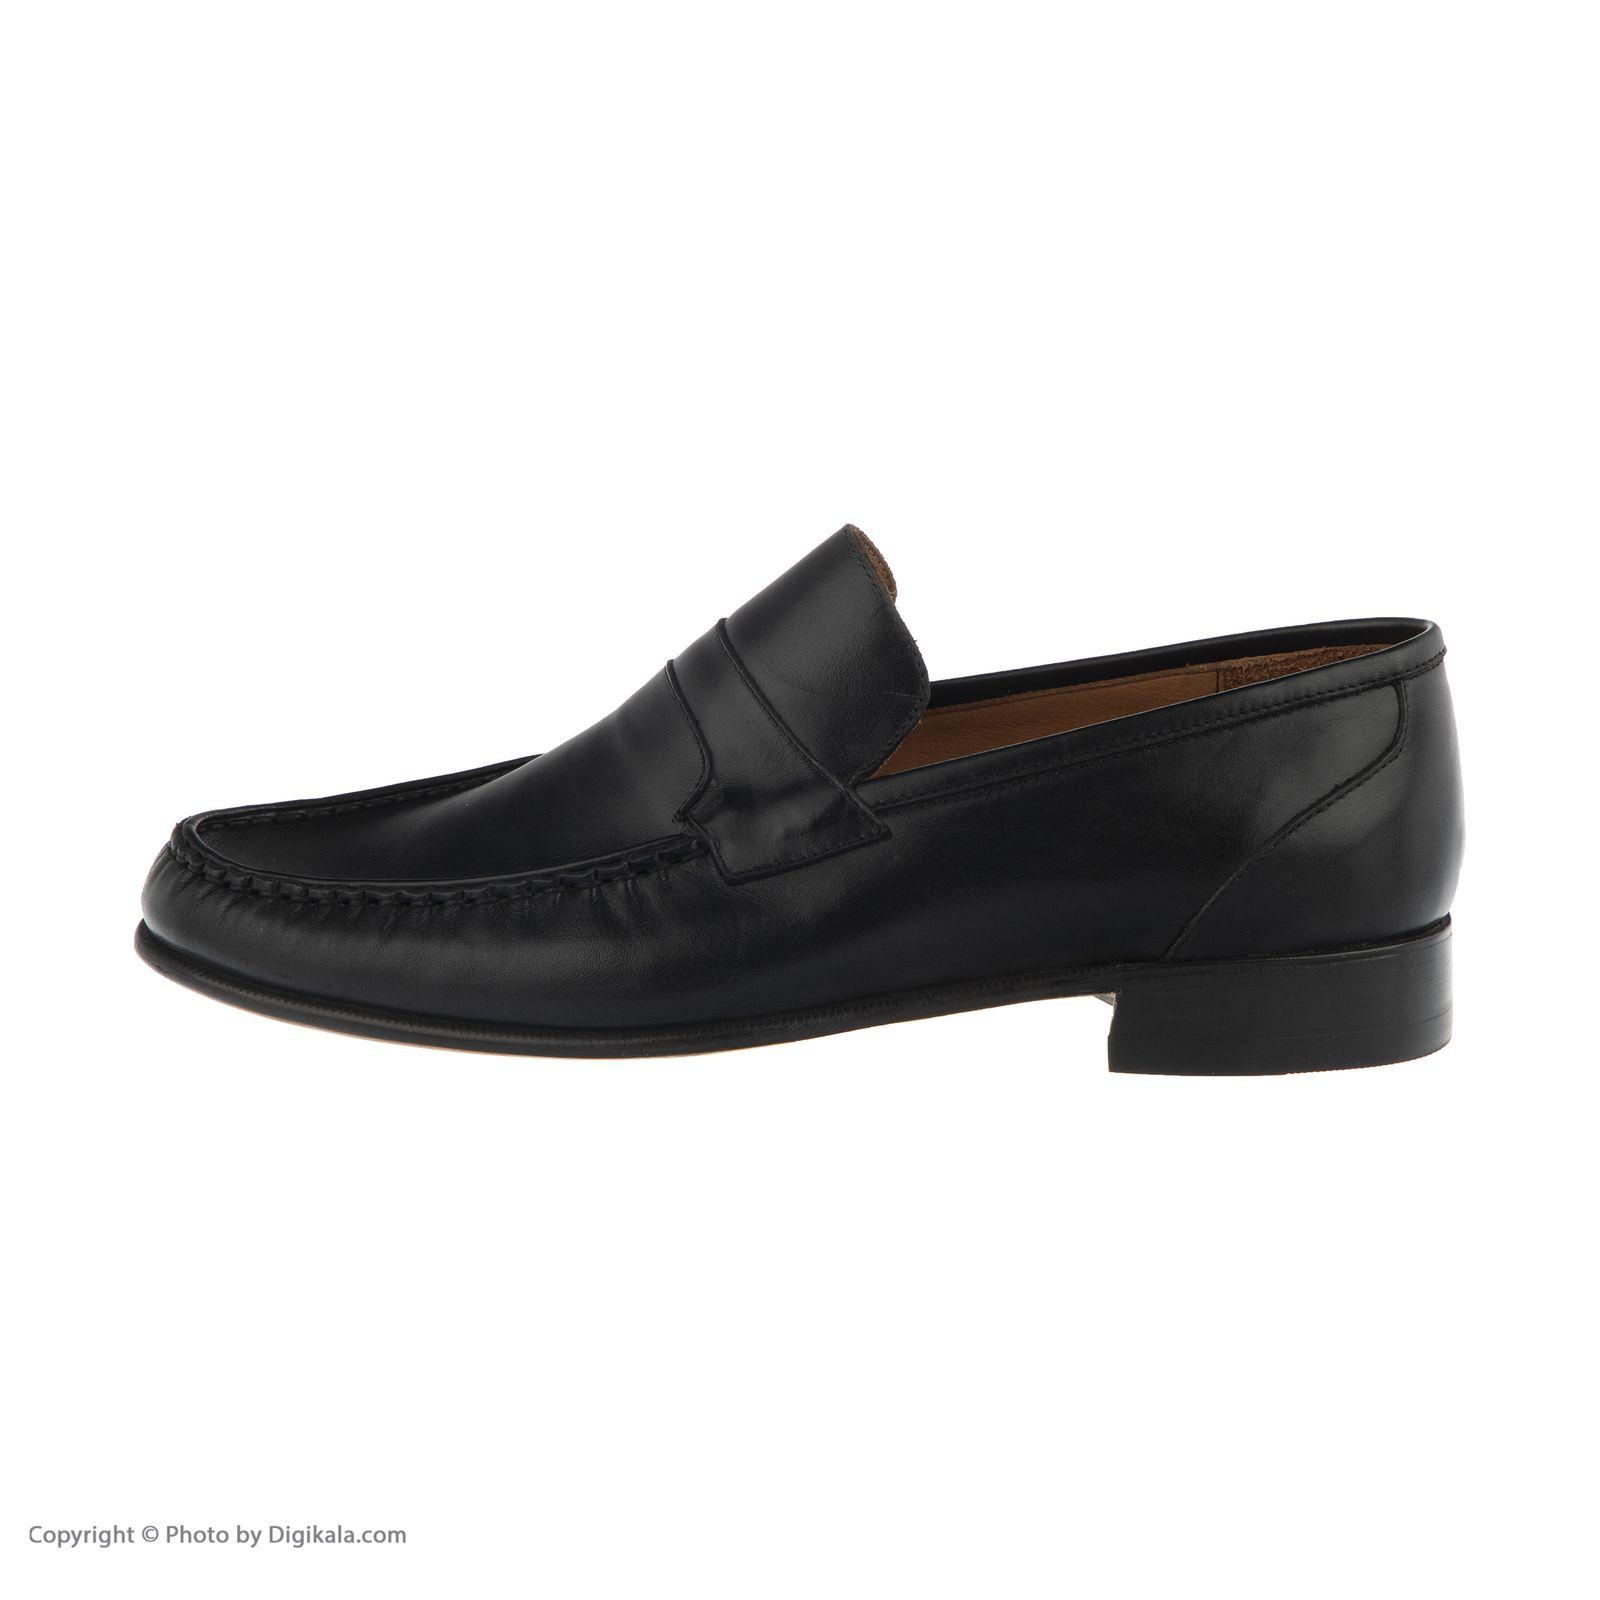 کفش مردانه نظری کد 409 -  - 1